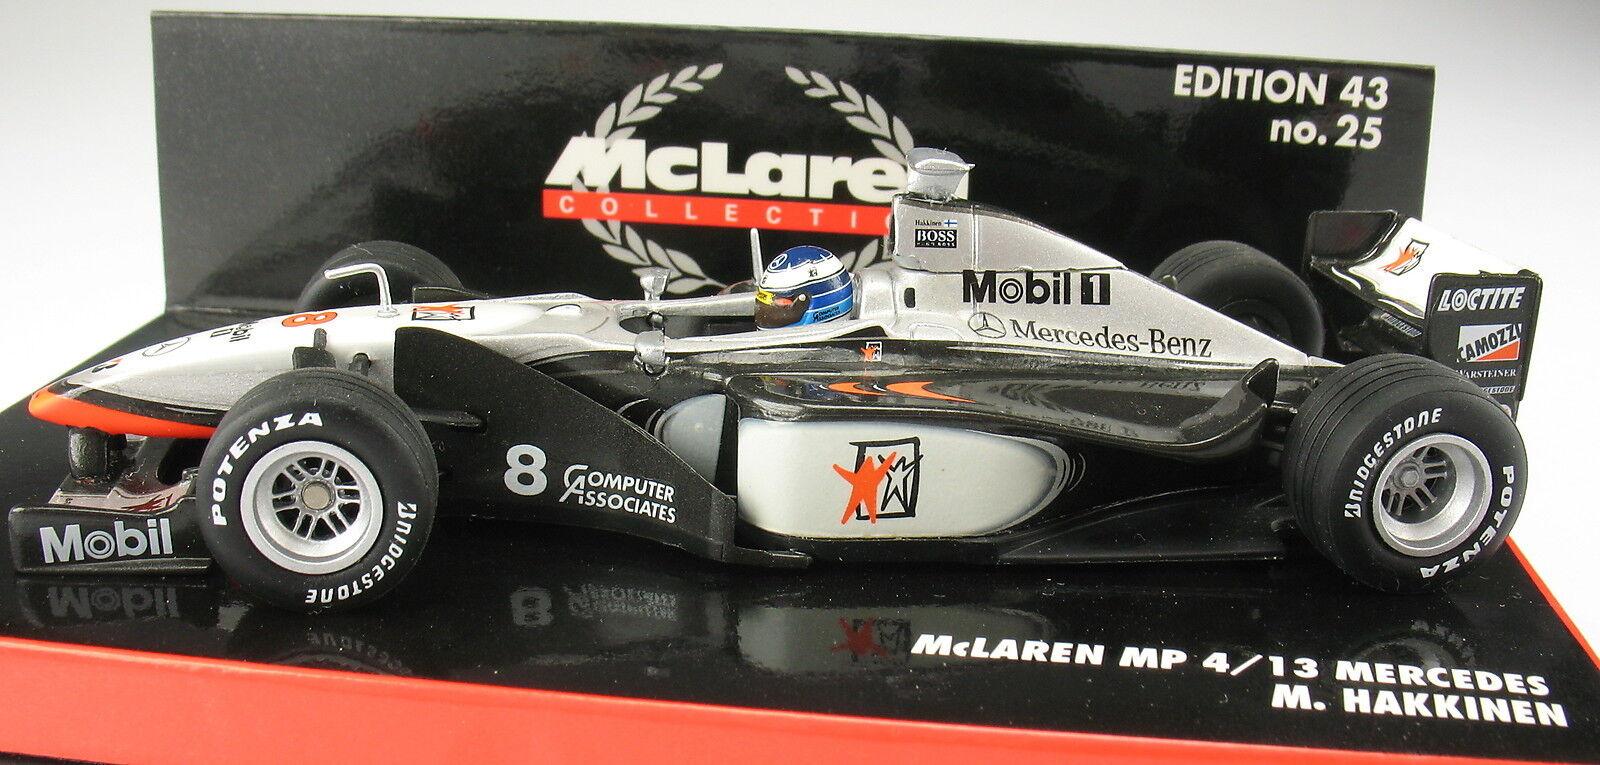 Minichamps-f1 McLaren MERCEDES MP 4-13 - Hakkinen-world champion 1998 - 1 43